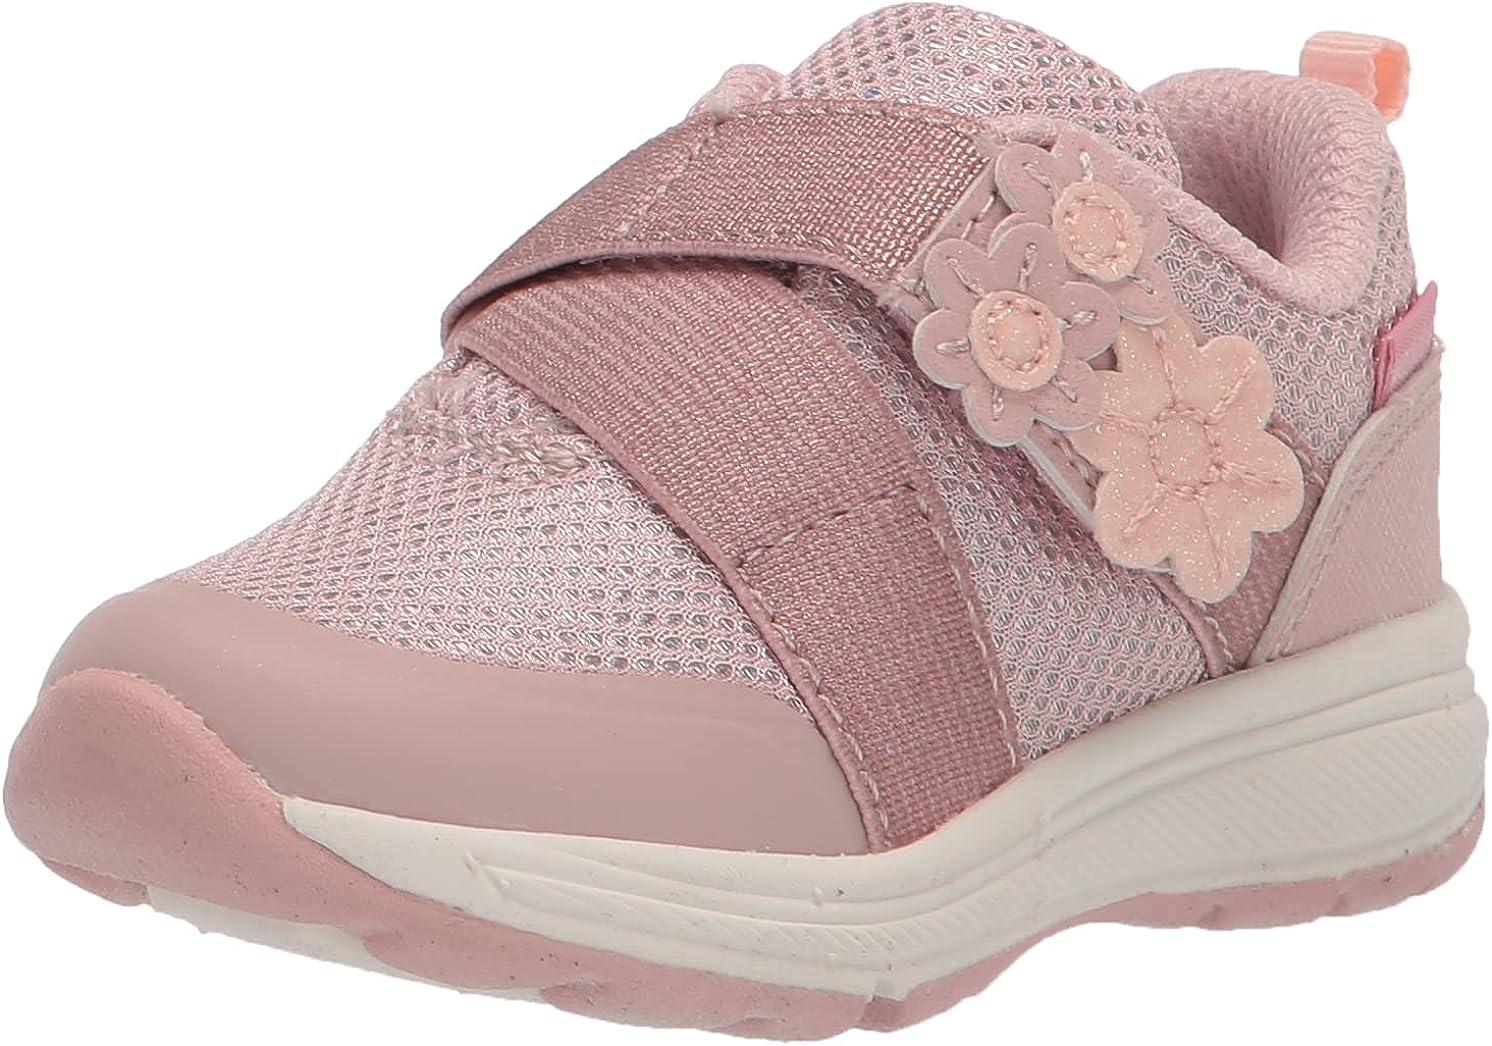 Stride Rite Girls Made2Play Josslyn Athletic Sneaker, Blush, 8 Toddler